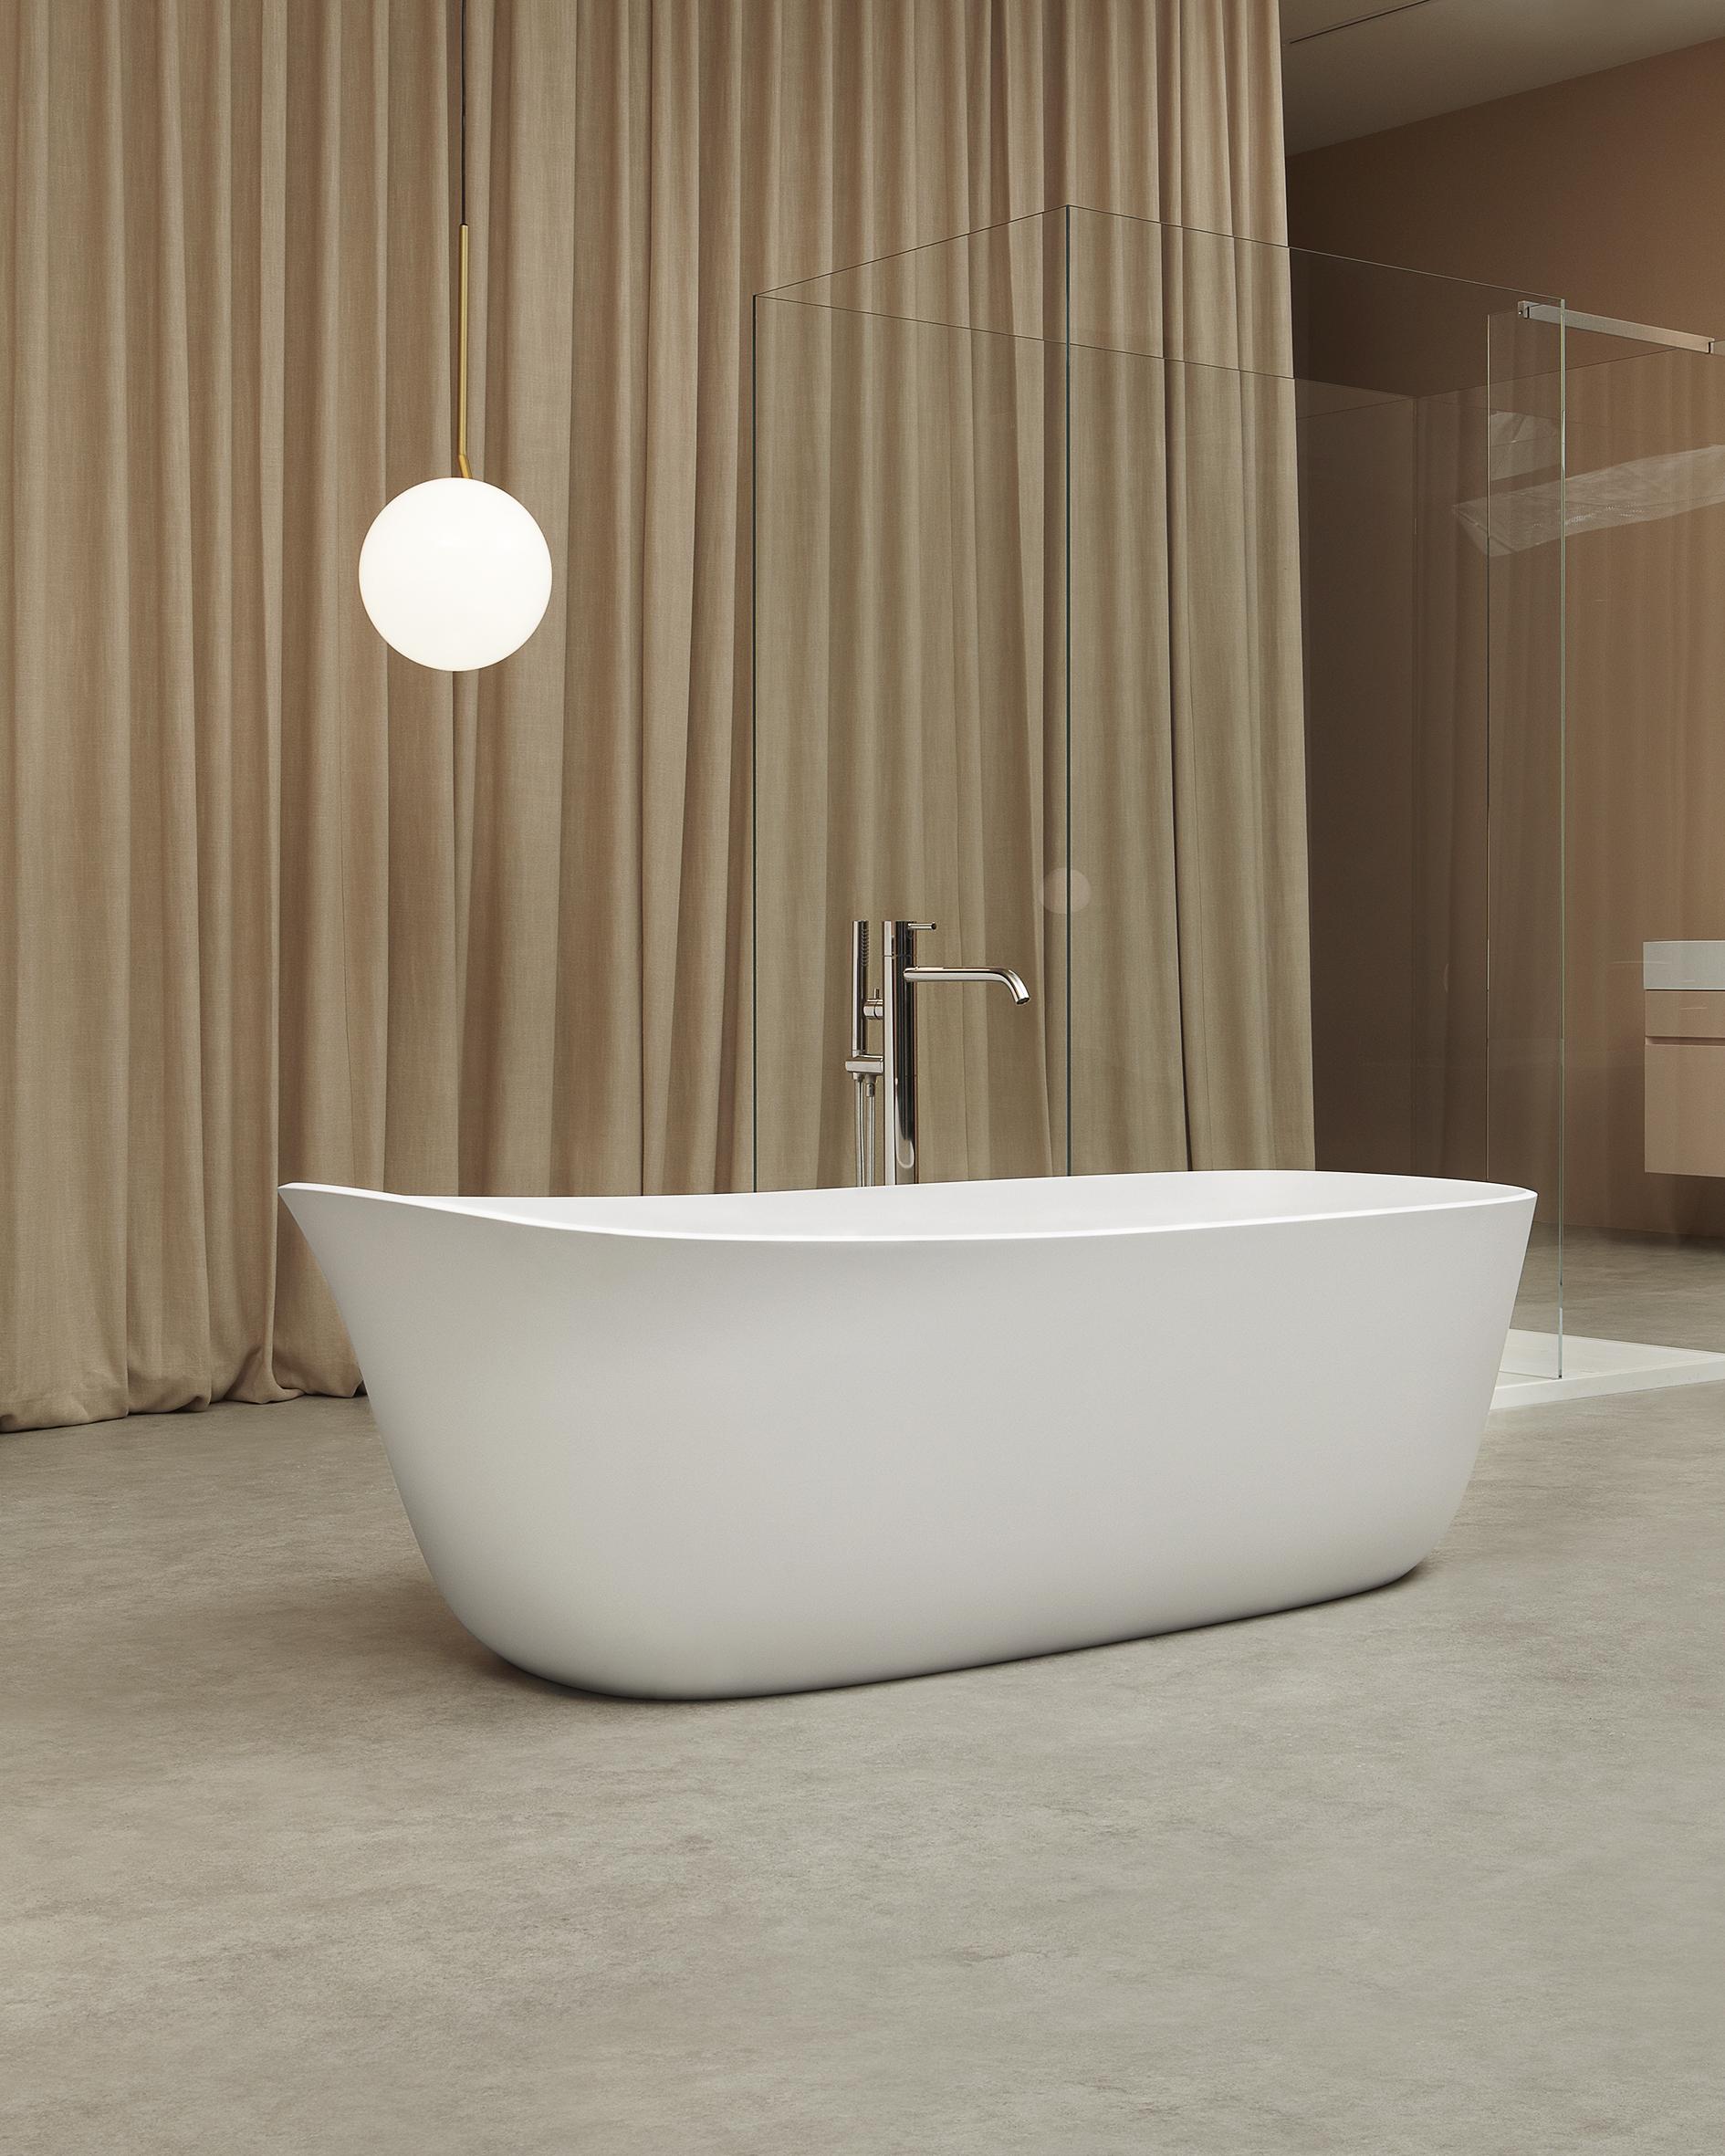 Dafne bathtub by Debiasi Sandri for Antoniolupi